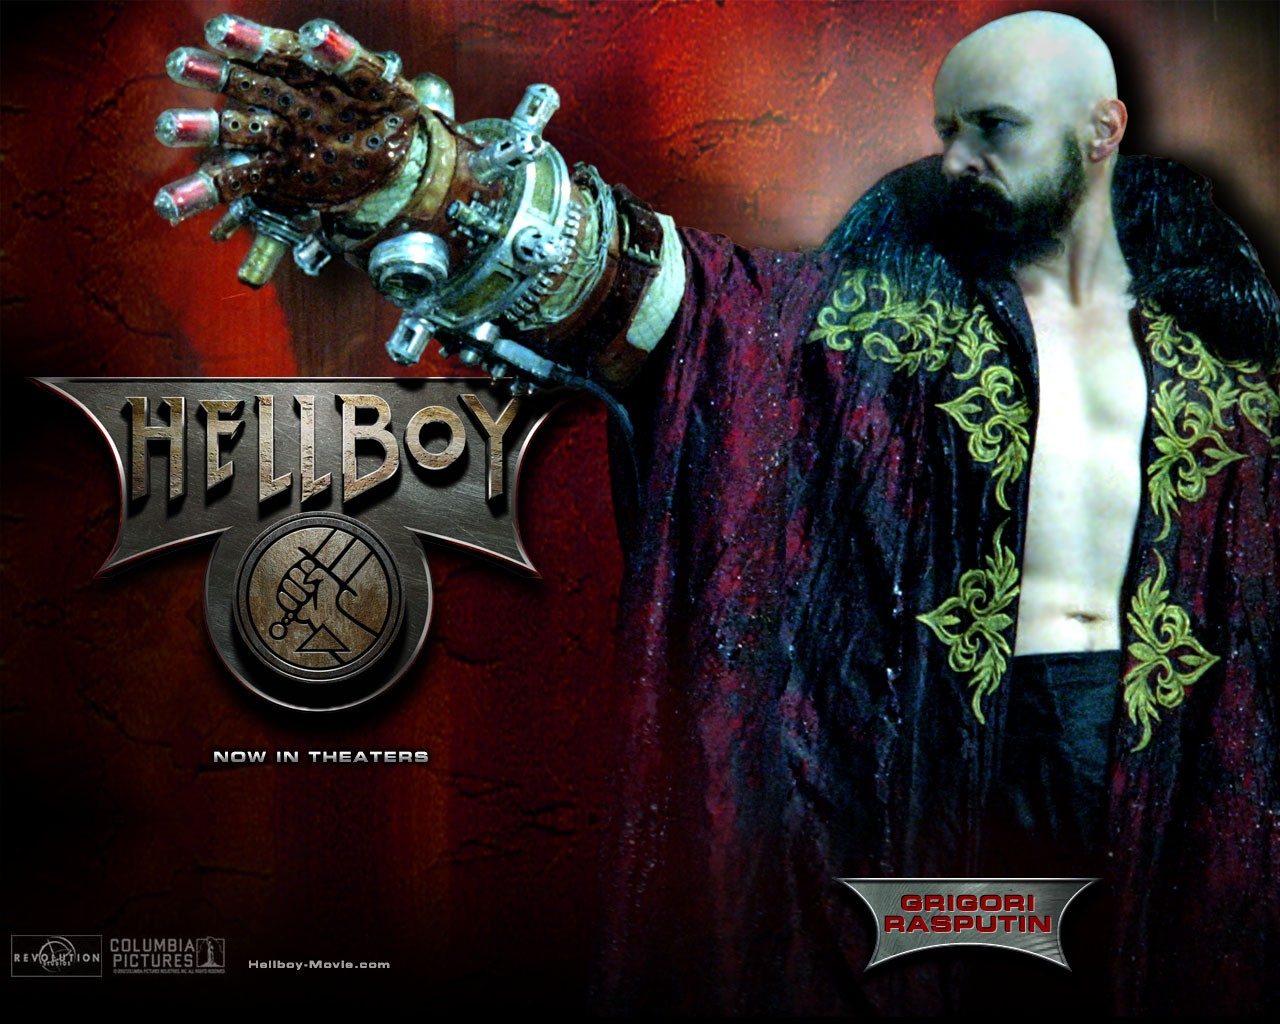 Wallpaper di Karel Roden che interpreta Grigori Rasputin nel film 'Hellboy'